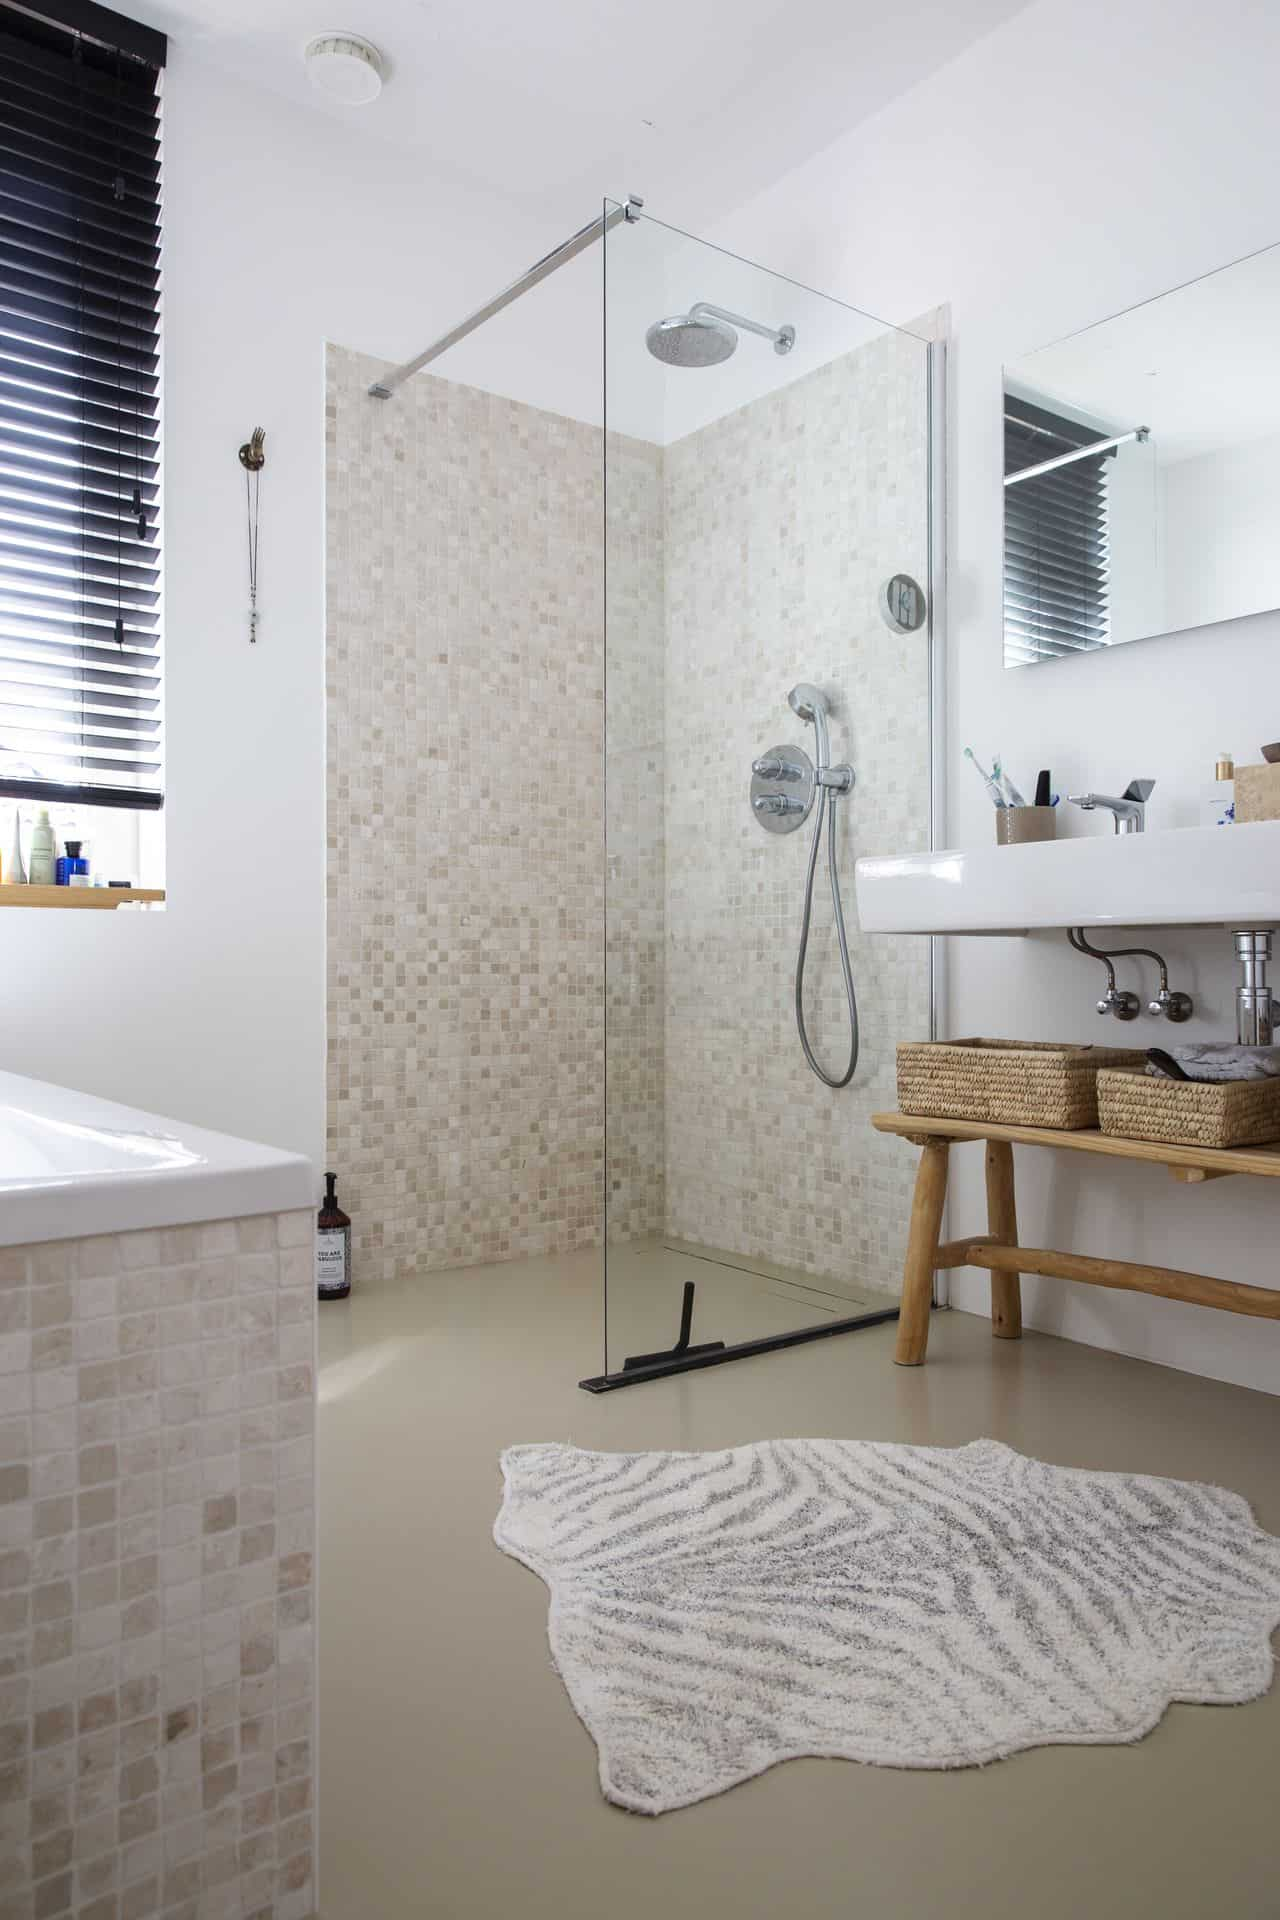 gietvloer badkamer, pu vloer badkamer, badkamer gietvloer